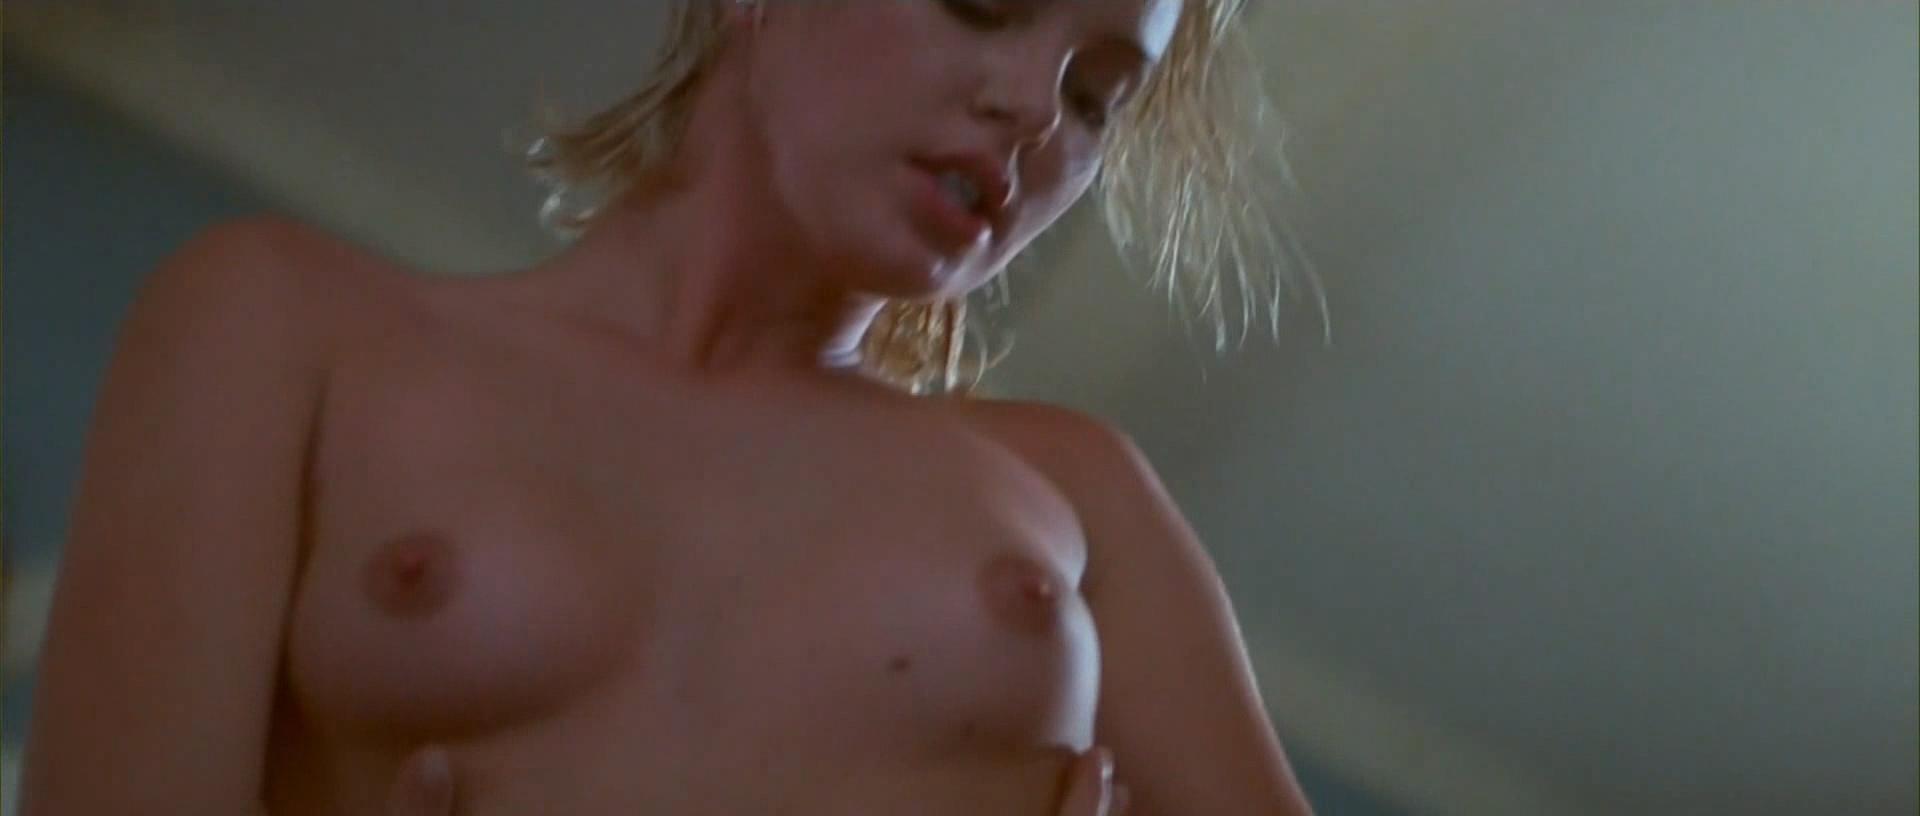 Ana Celia De Armas Sex charlize theron - 2 days in the valley (1996) - celebs